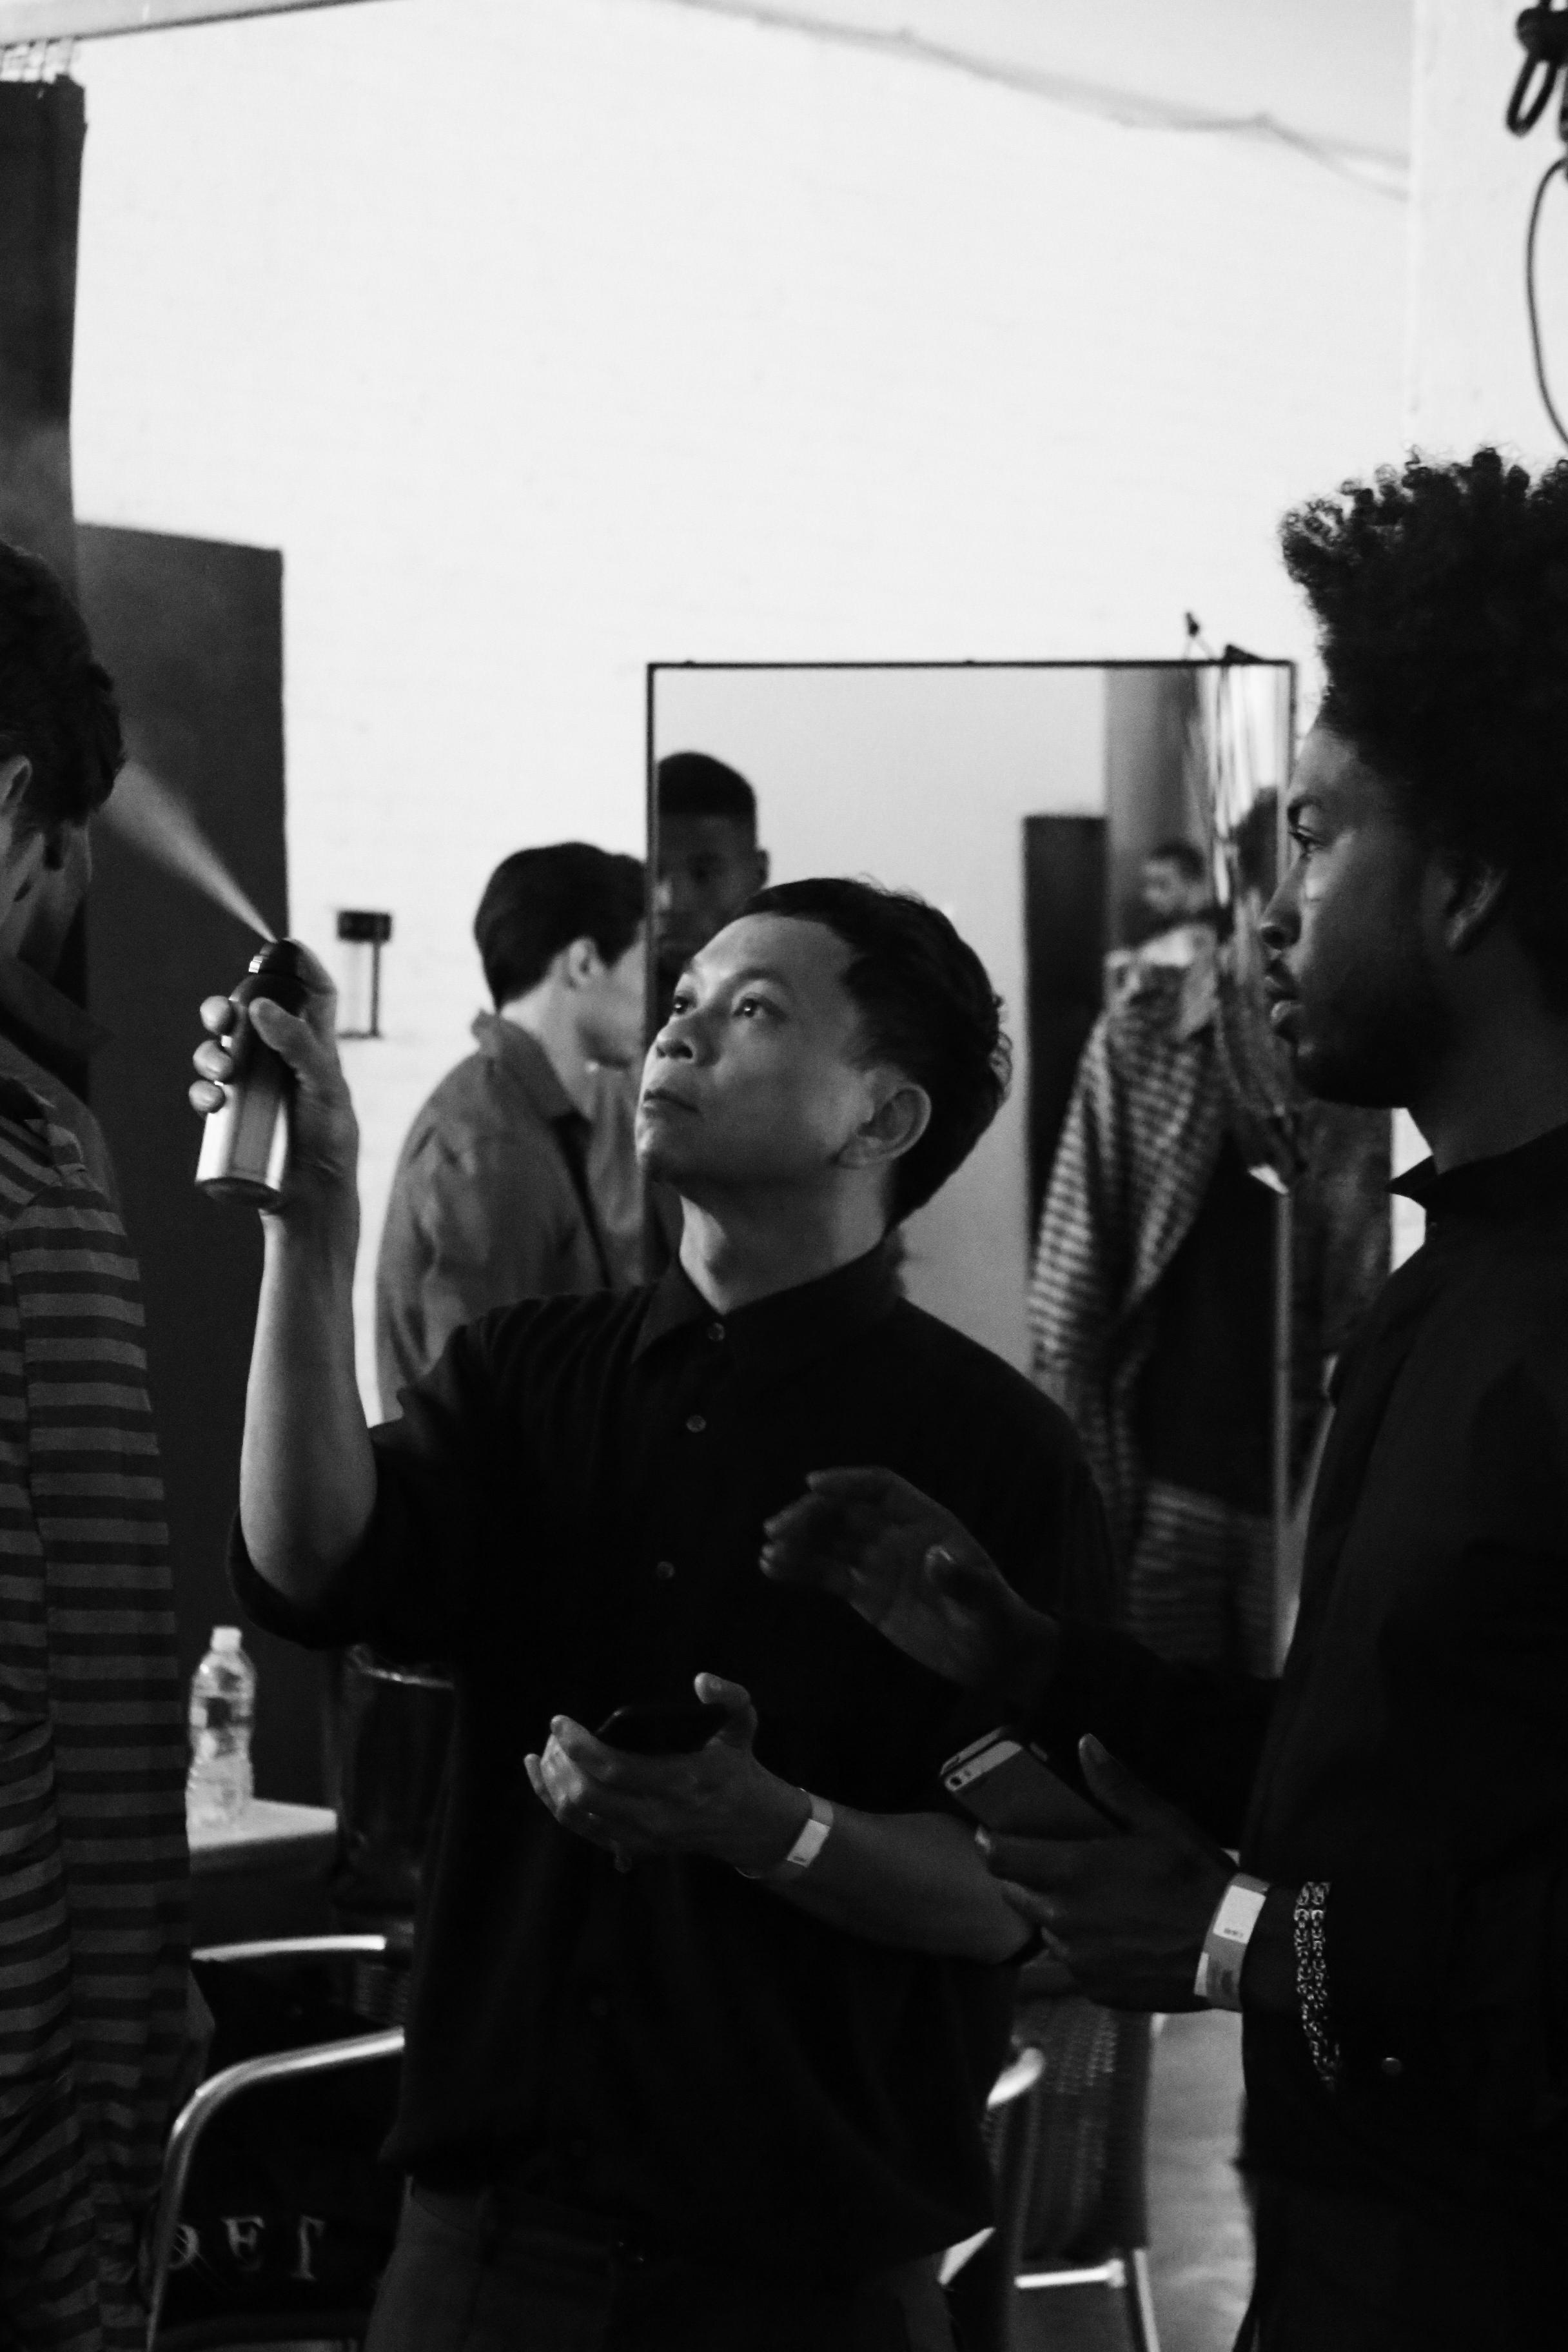 NEW YORK FASHION WEEK MENS #NYFWM   CADET   SPRING/SUMMER '16  Featuring: CADET @cadetusa //Key Hair: Nathan Nguyen @nathanlibra for Oribe Hair Care @oribe //Hair Team: Oribe Hair Care Team   Umbrella Salon @umbrellasalon @industriasuperstudio Photo by: Anthony Deeying